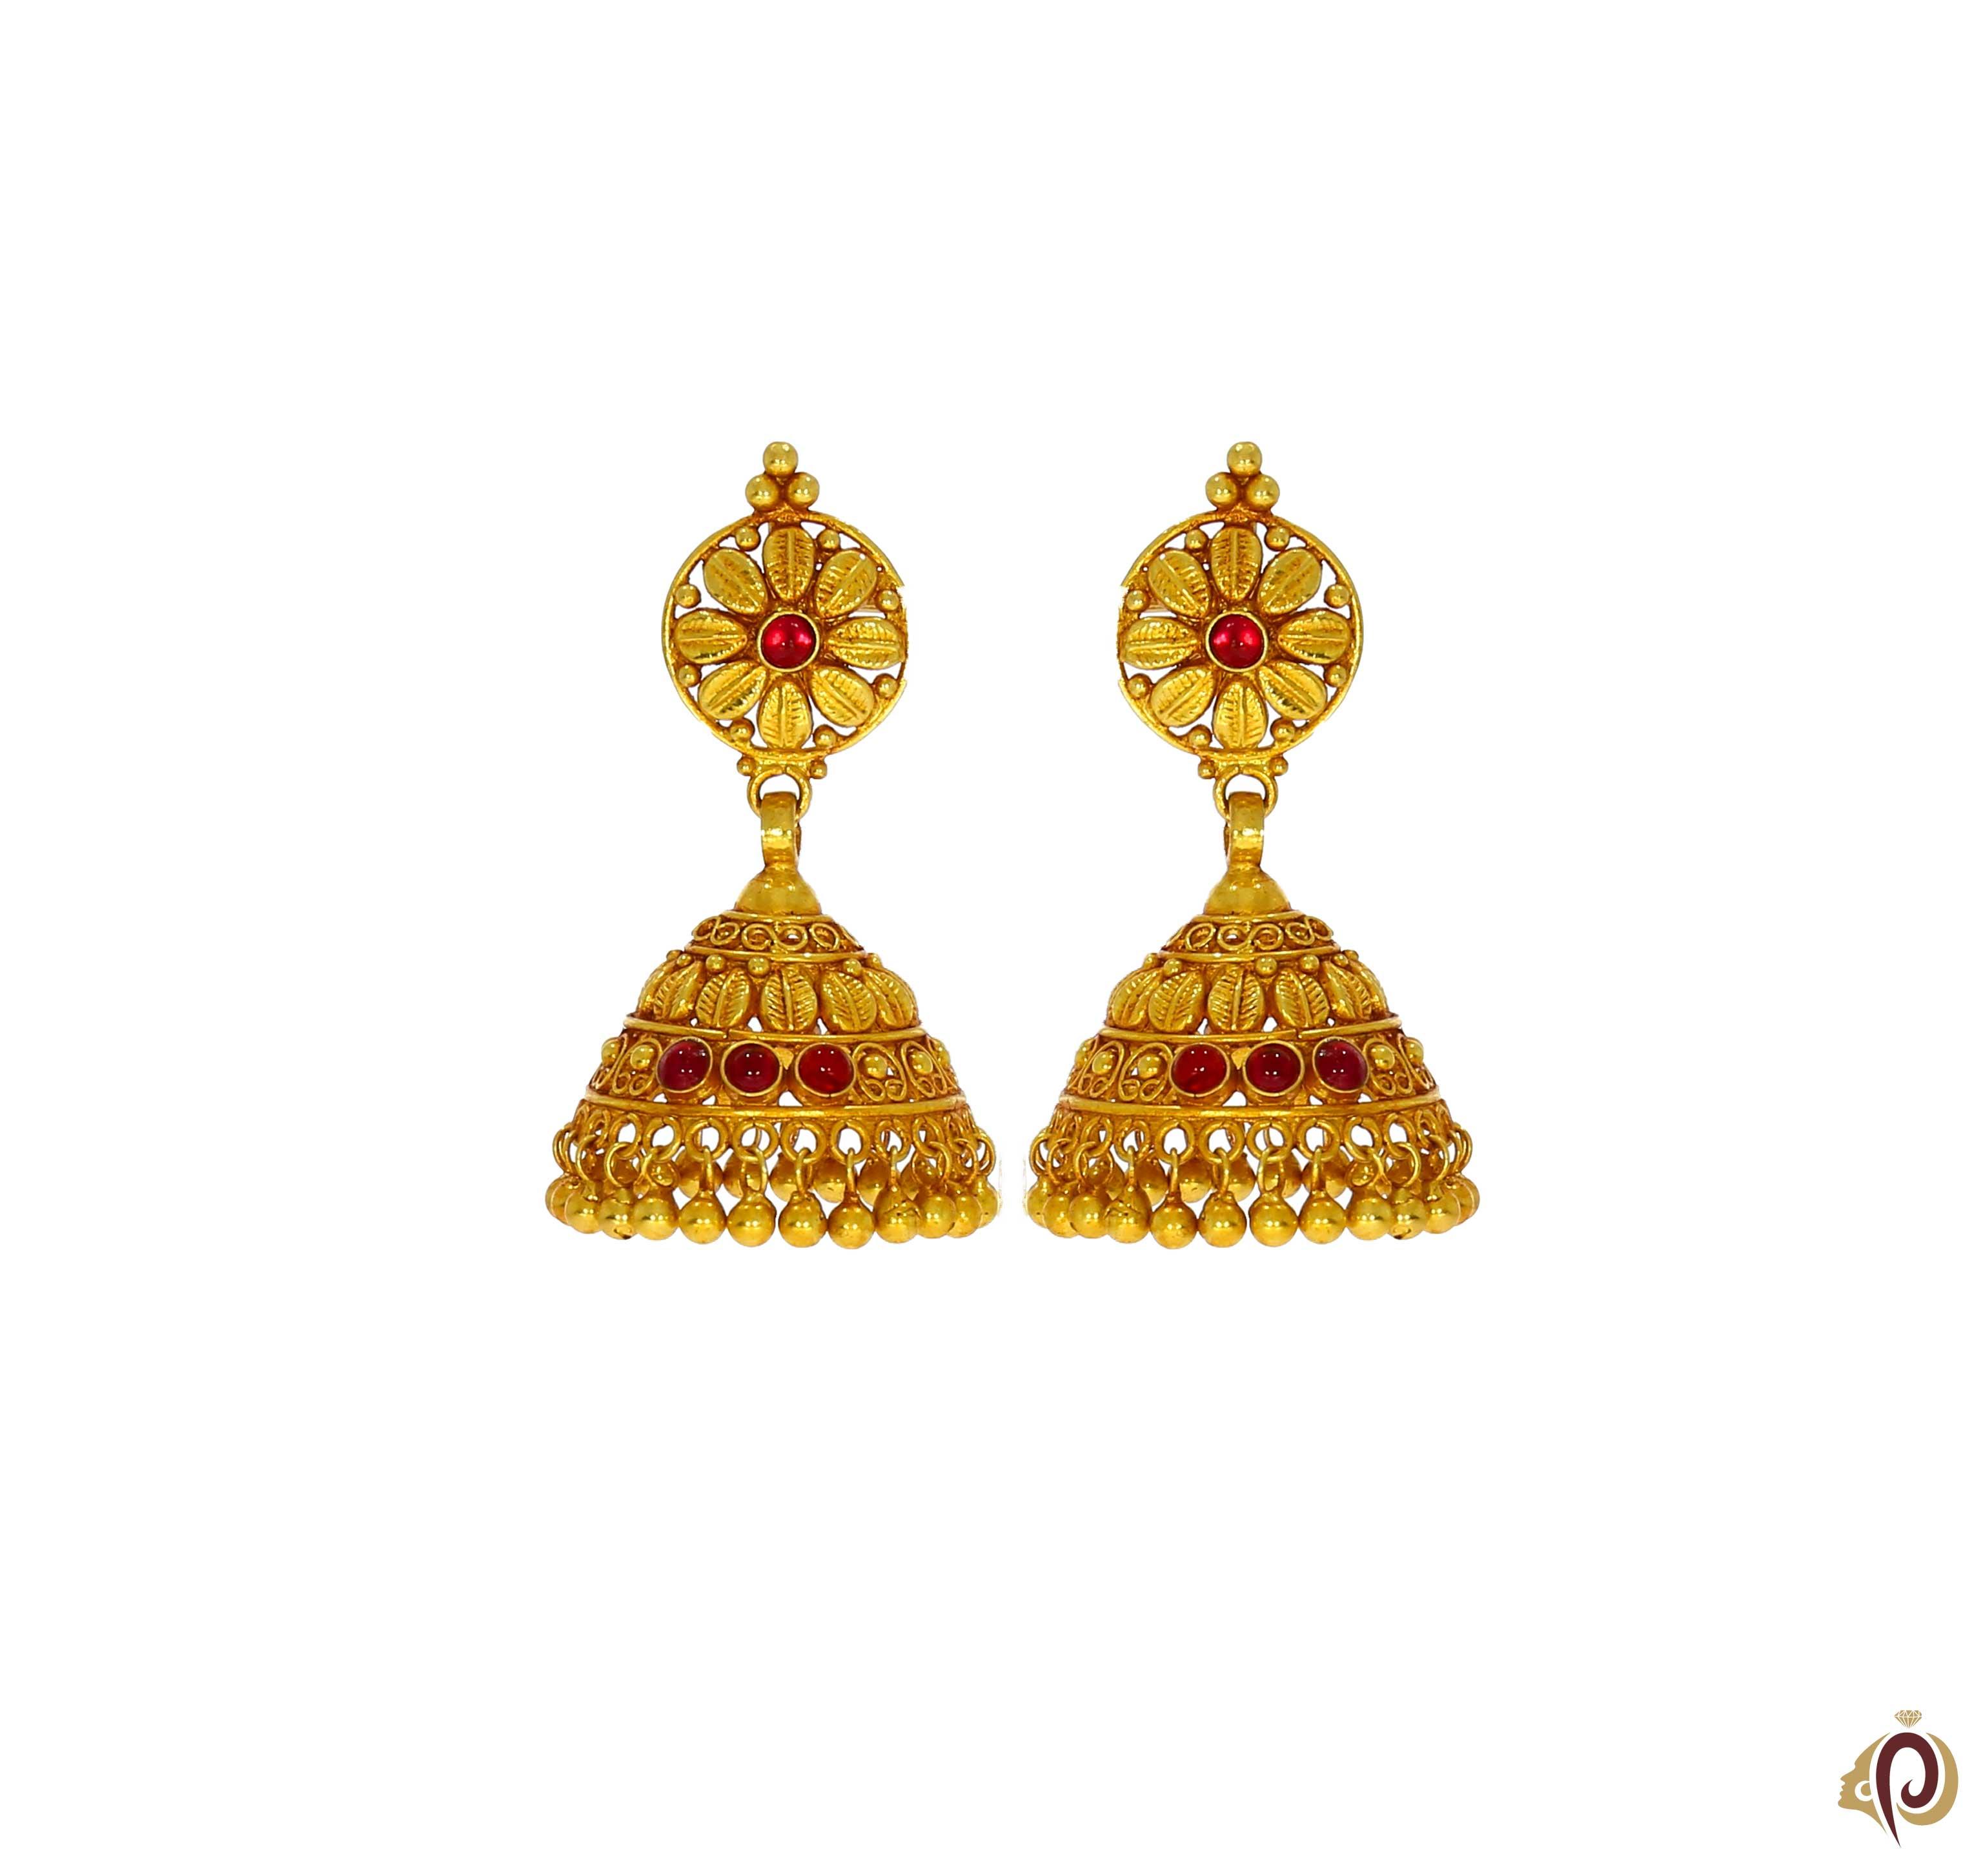 Clipart pune gold earrings clipart library Beautyful Designer Red Stone Golden Zumka Tops clipart library